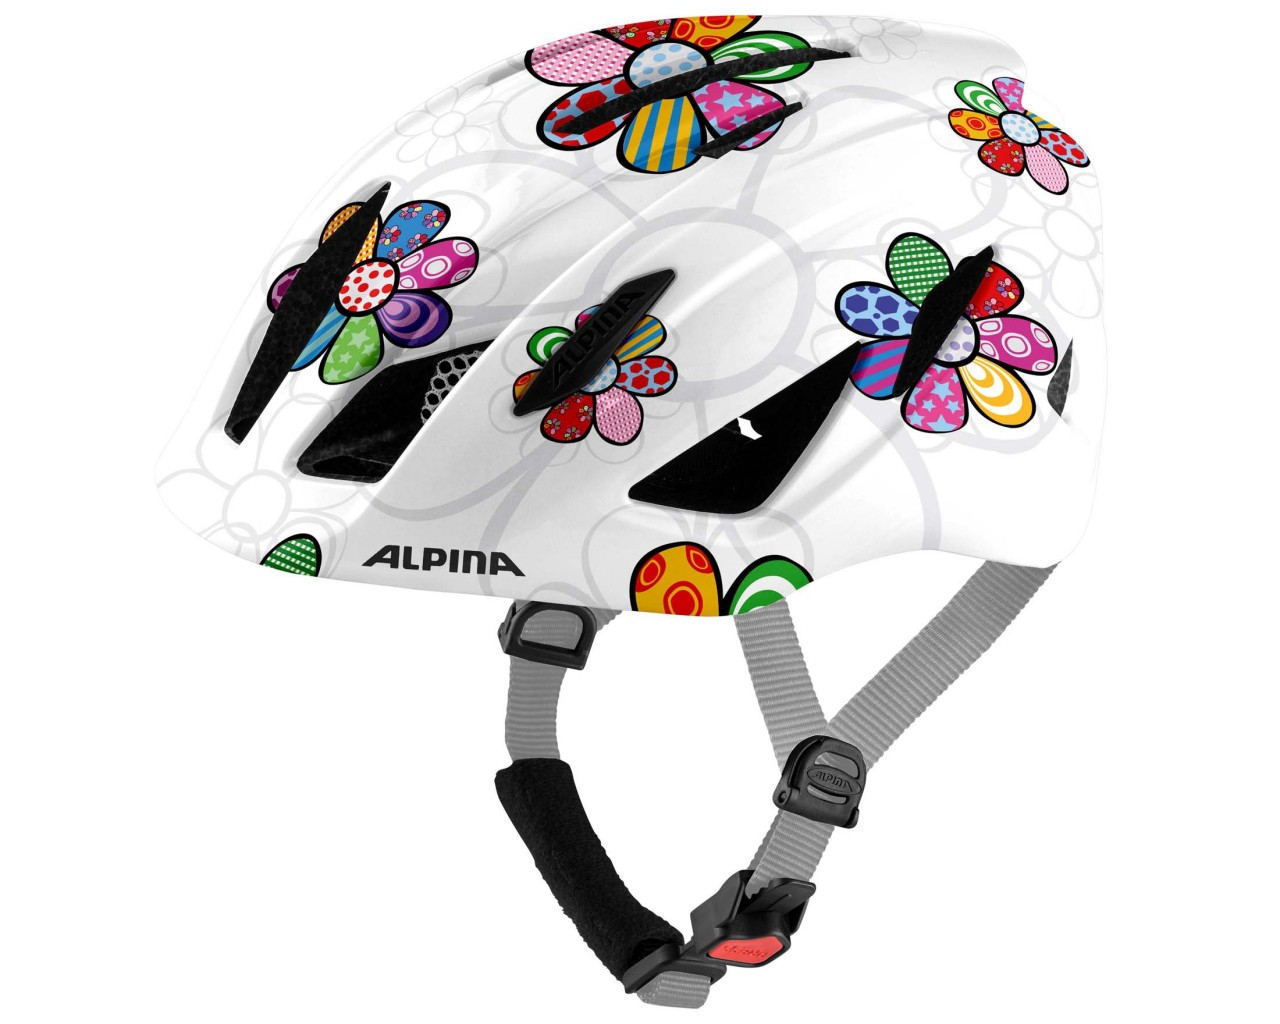 Alpina Pico Kids Bike Helmet | pearlwhite-flower gloss 50-55